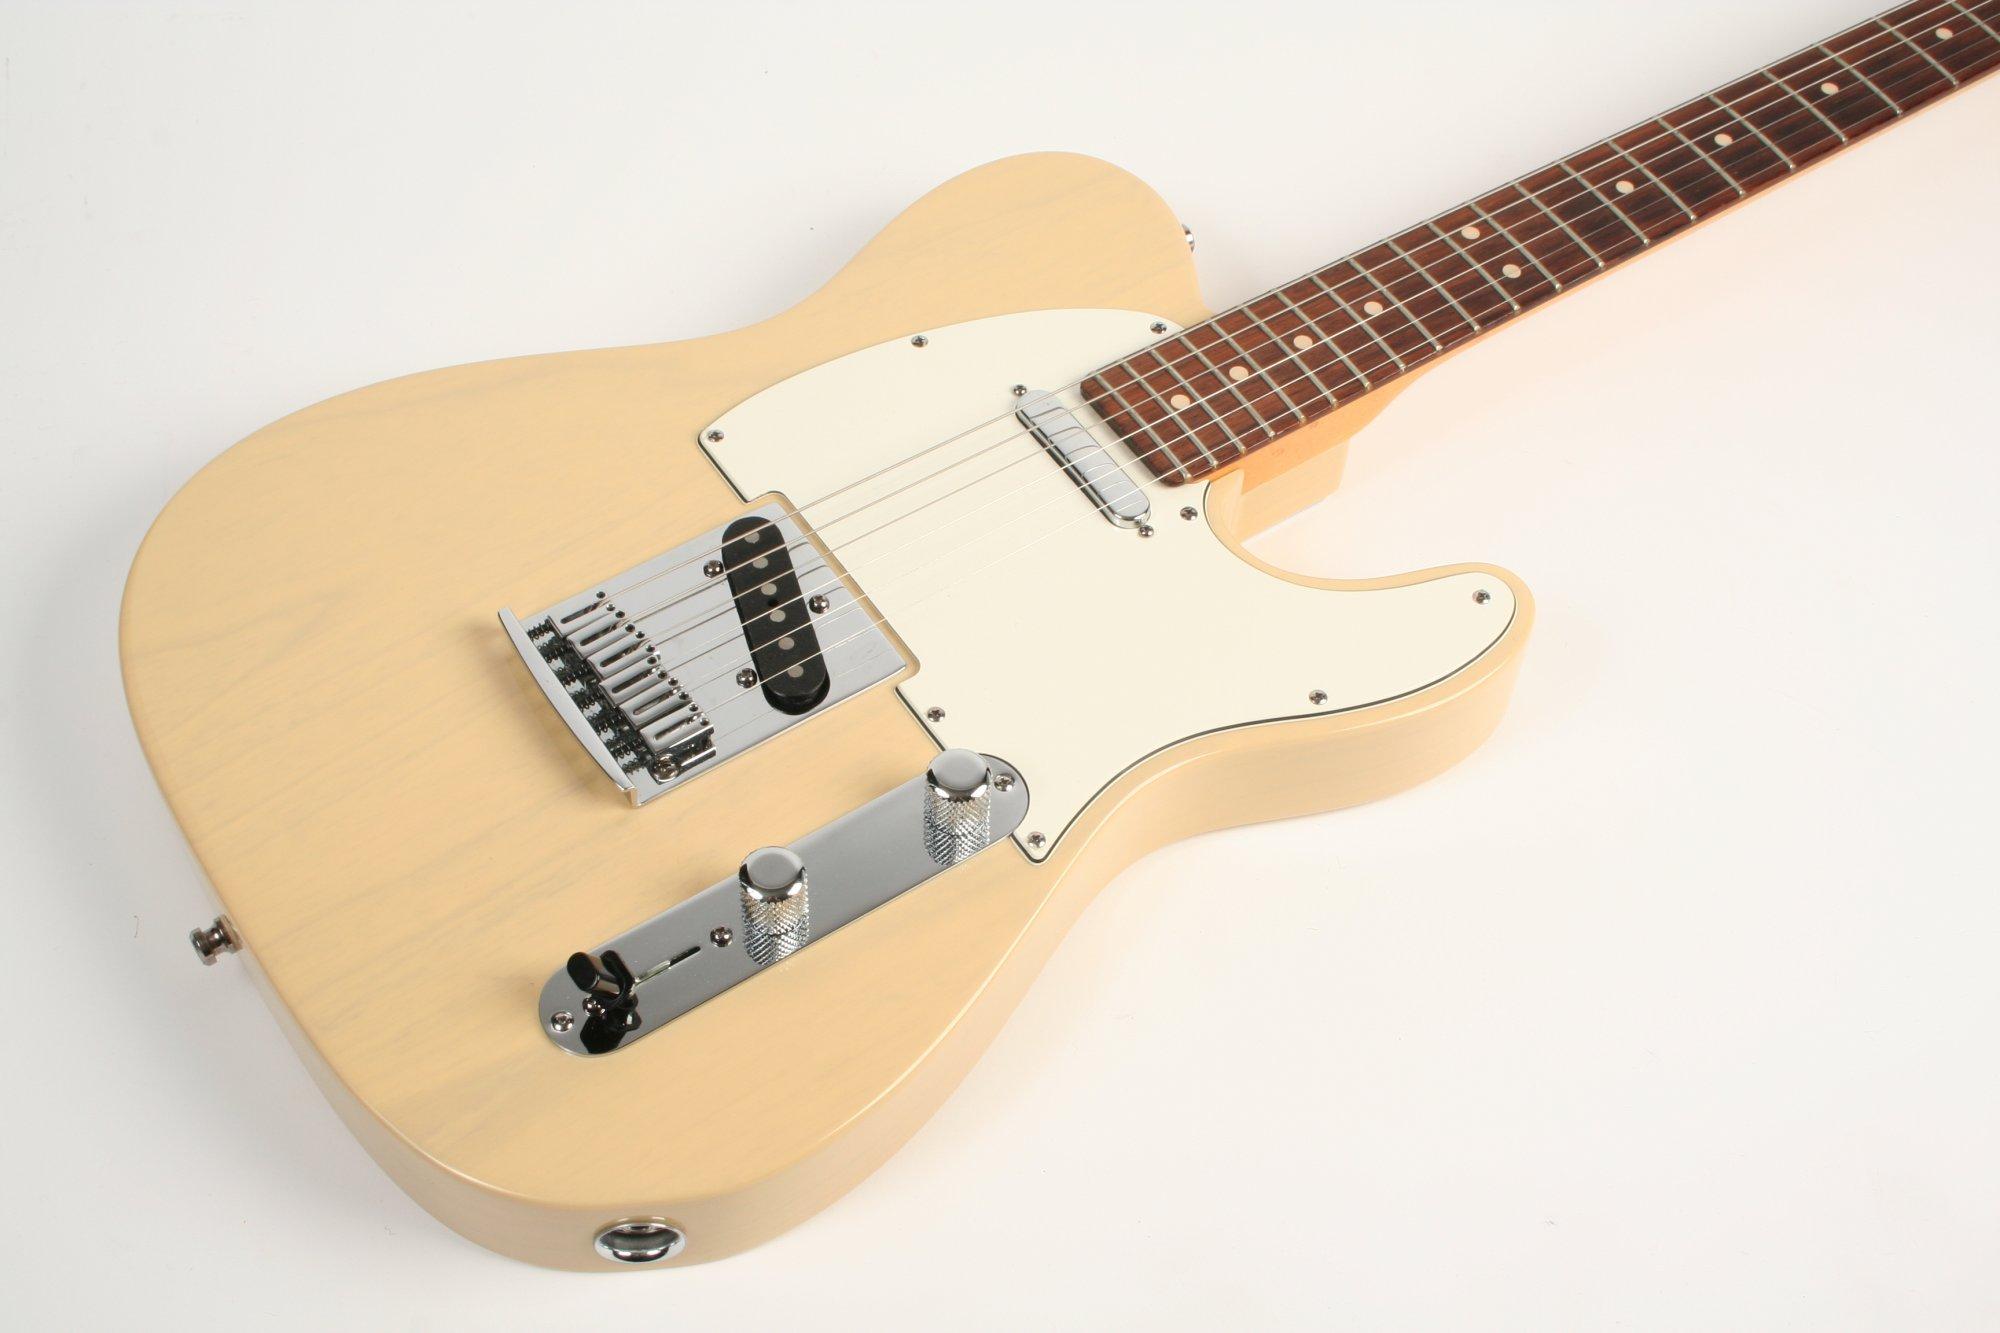 Fender Custom Shop Custom Classic Telecaster 2007